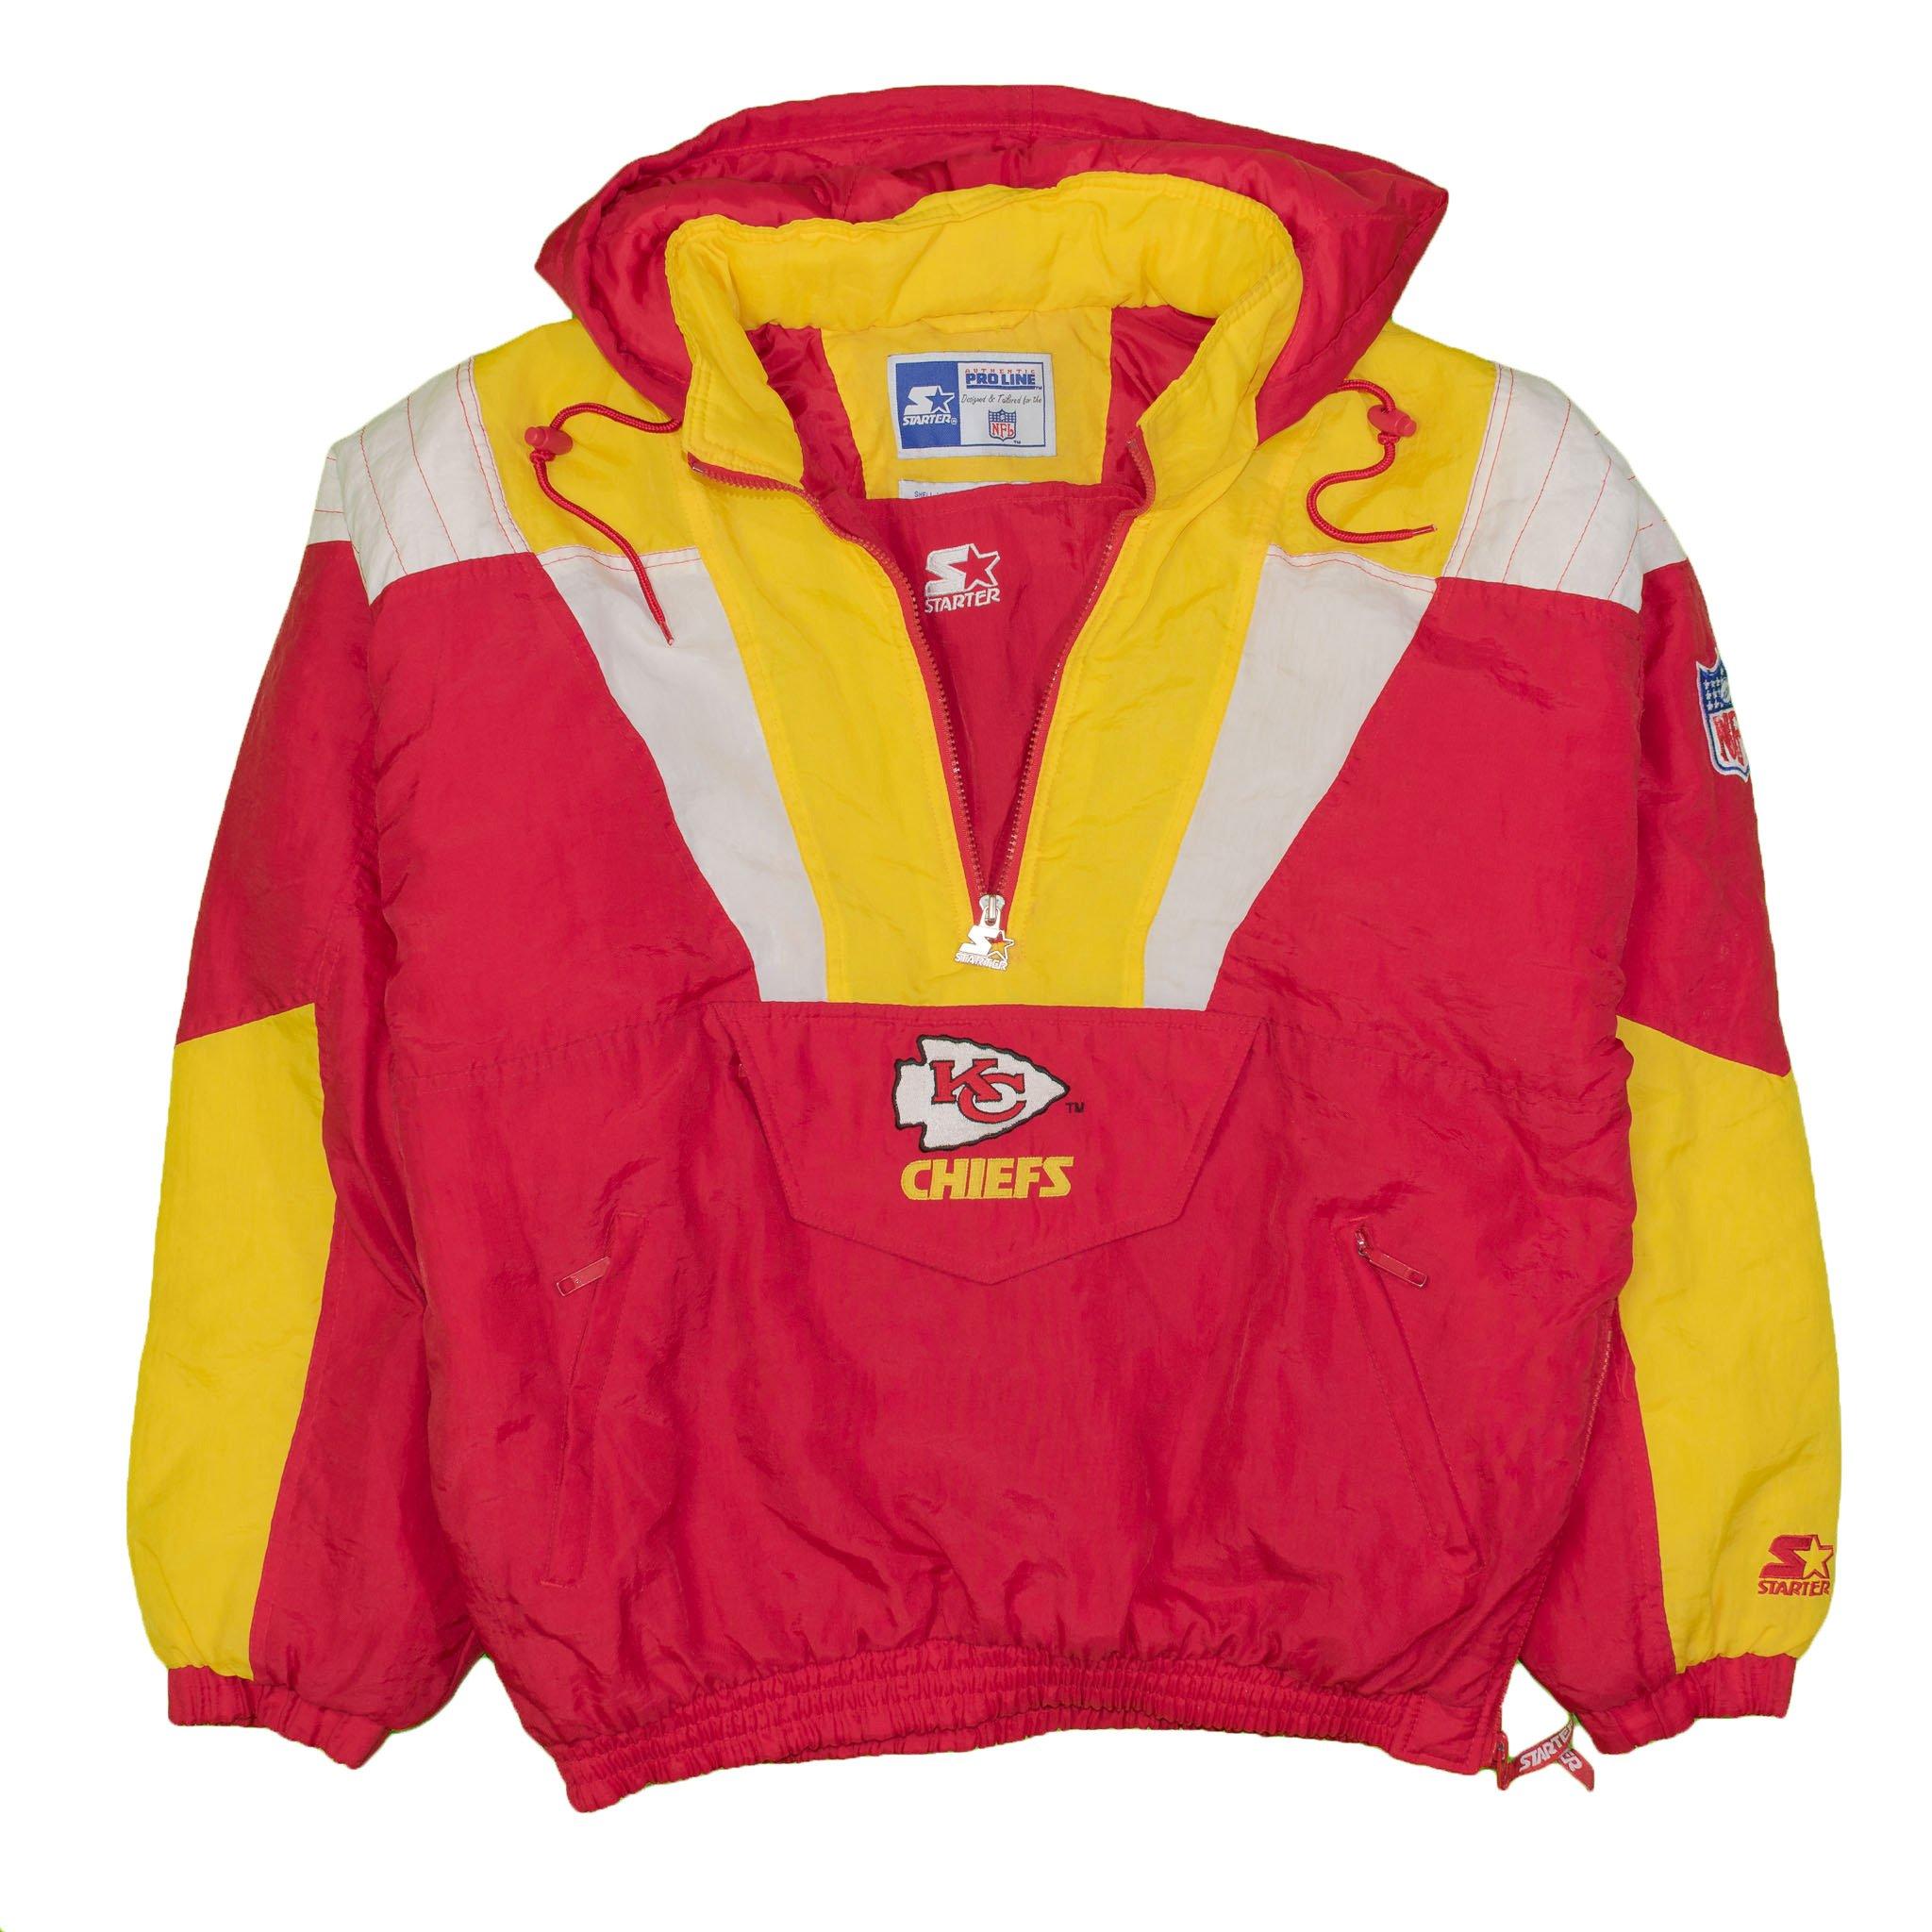 30ab74d36 Starter Men s Jacket Large Kansas City Chiefs Vintage 90 s Football NF –  itisvintage  1990s